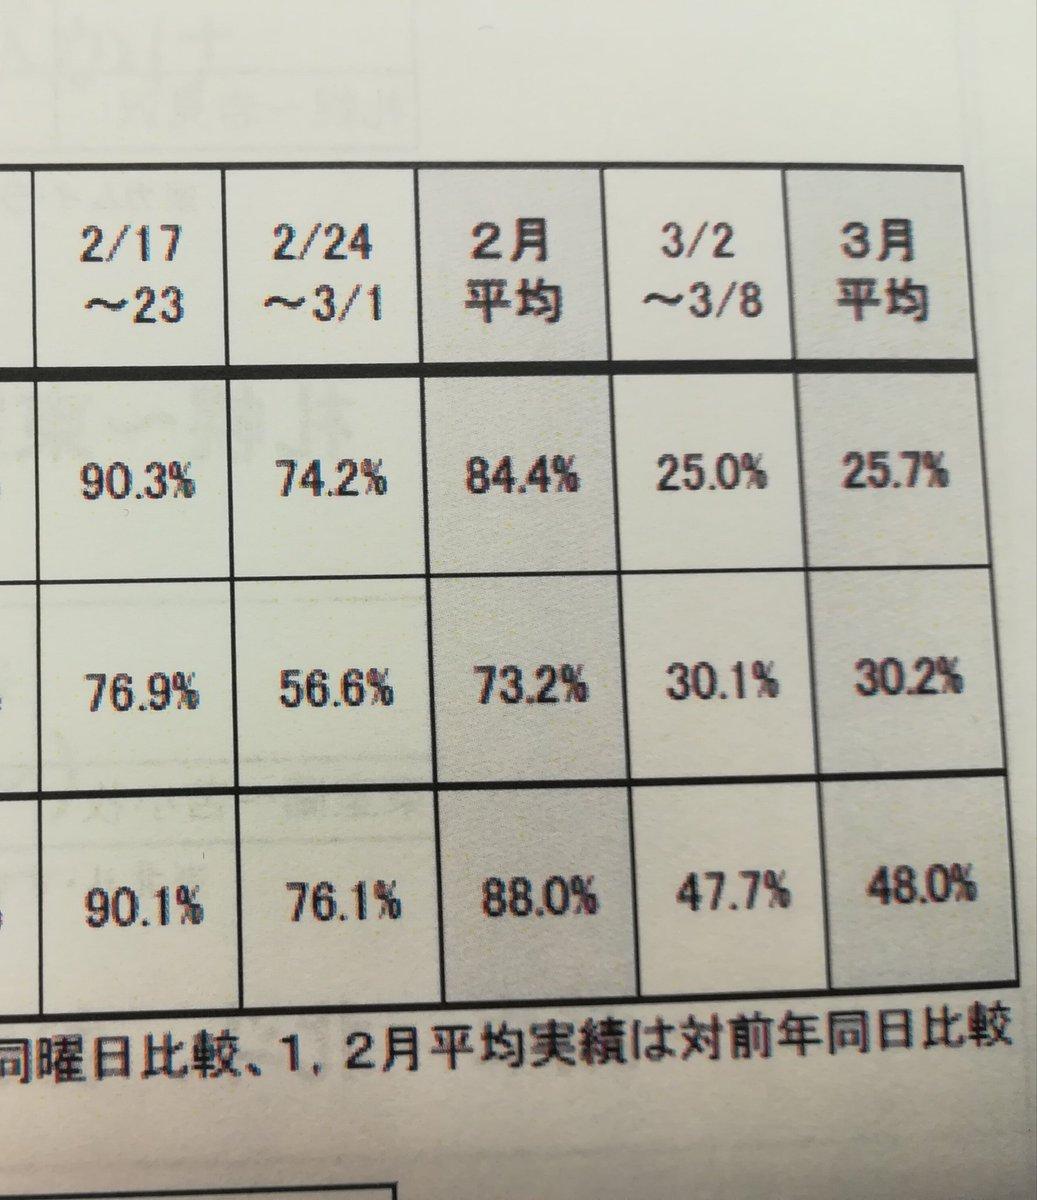 test ツイッターメディア - 今朝はJR北海道・四国・貨物各社から要望。コロナの影響は3月以降、一段と深刻に…。北海道新幹線は前年比25%。四国は全体で約60%減。 公共交通機関の安全性と持続性を確保していくよう国交省と協議します。 #新型コロナウイルス #物流 https://t.co/p7Rwx2hqEq